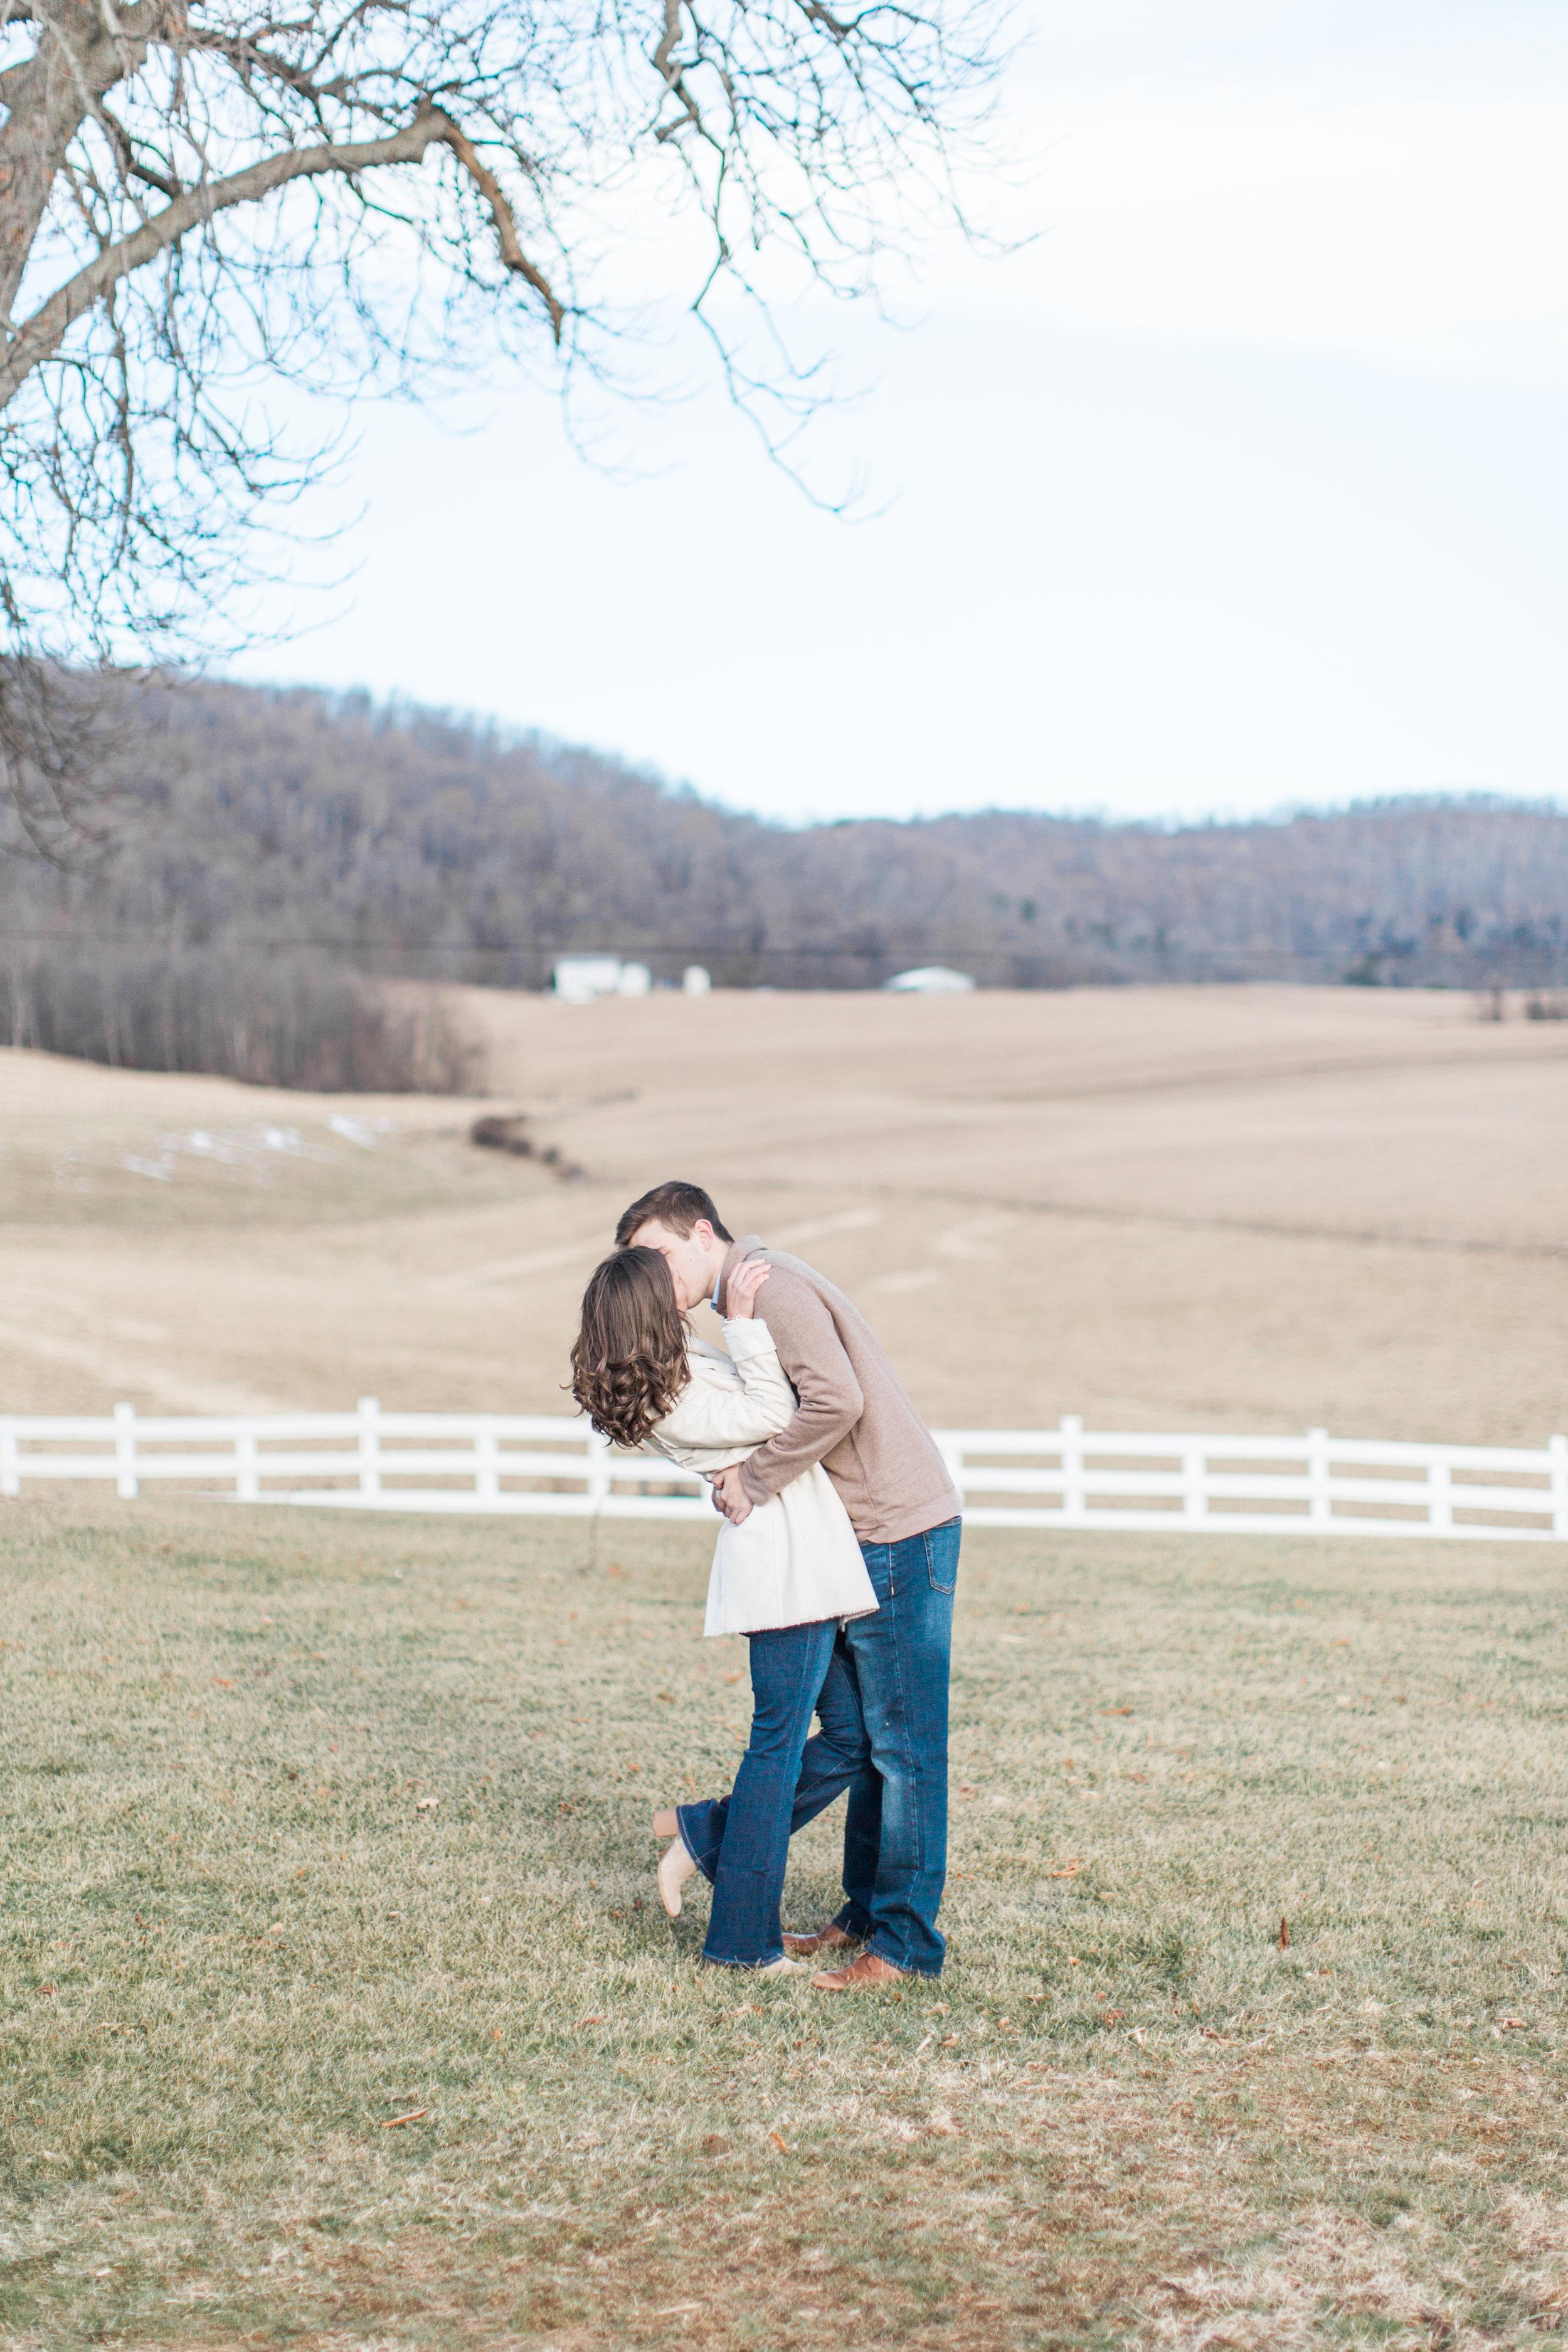 Abigail_Jill_Photography_Maryland_Engagement_Farm_Emily_Justin186.jpg